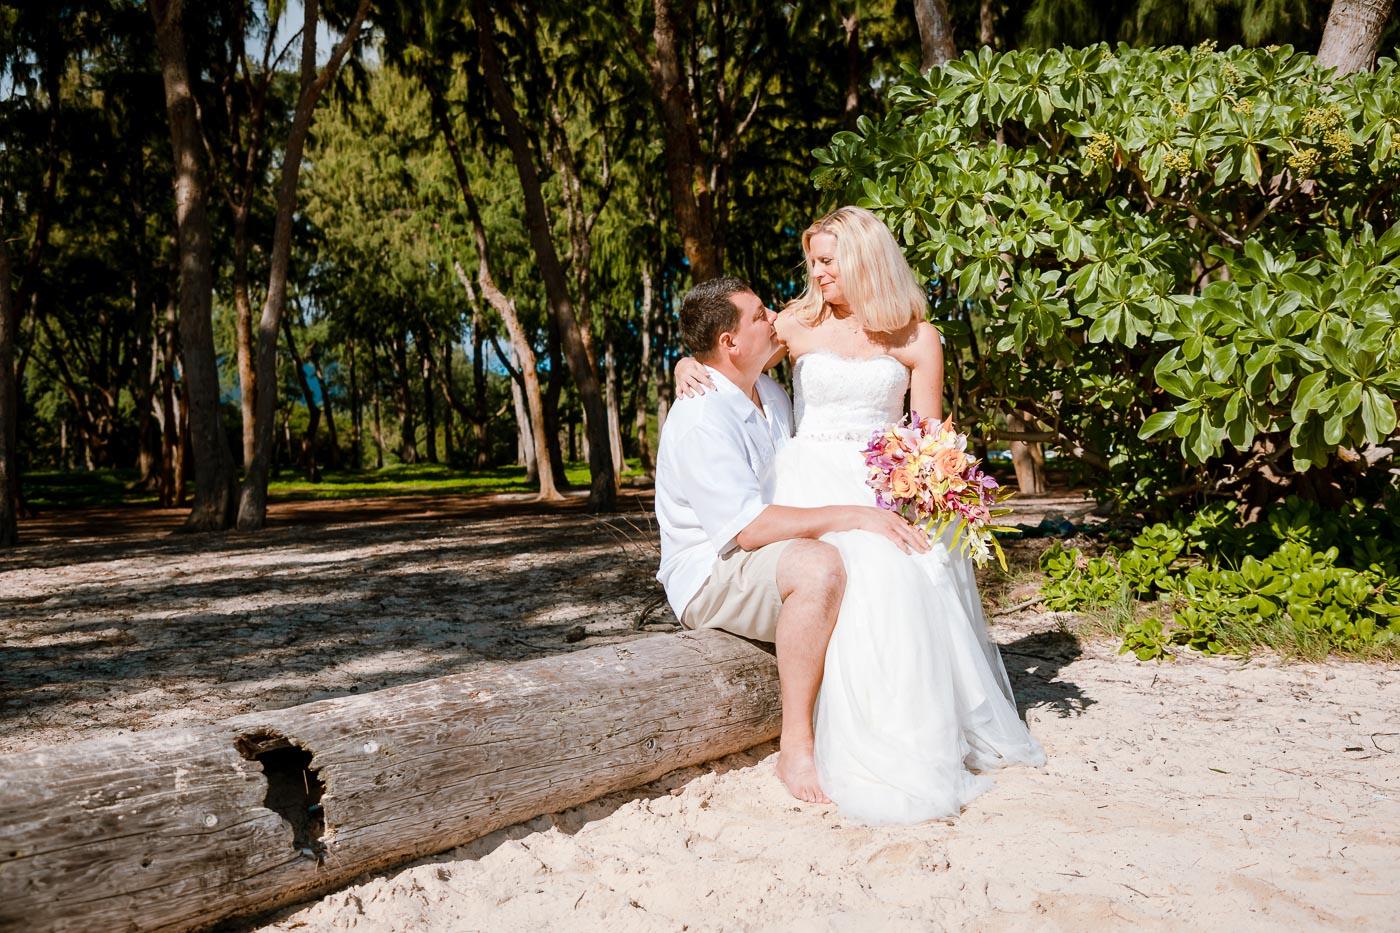 wedding-redux-41220.jpg